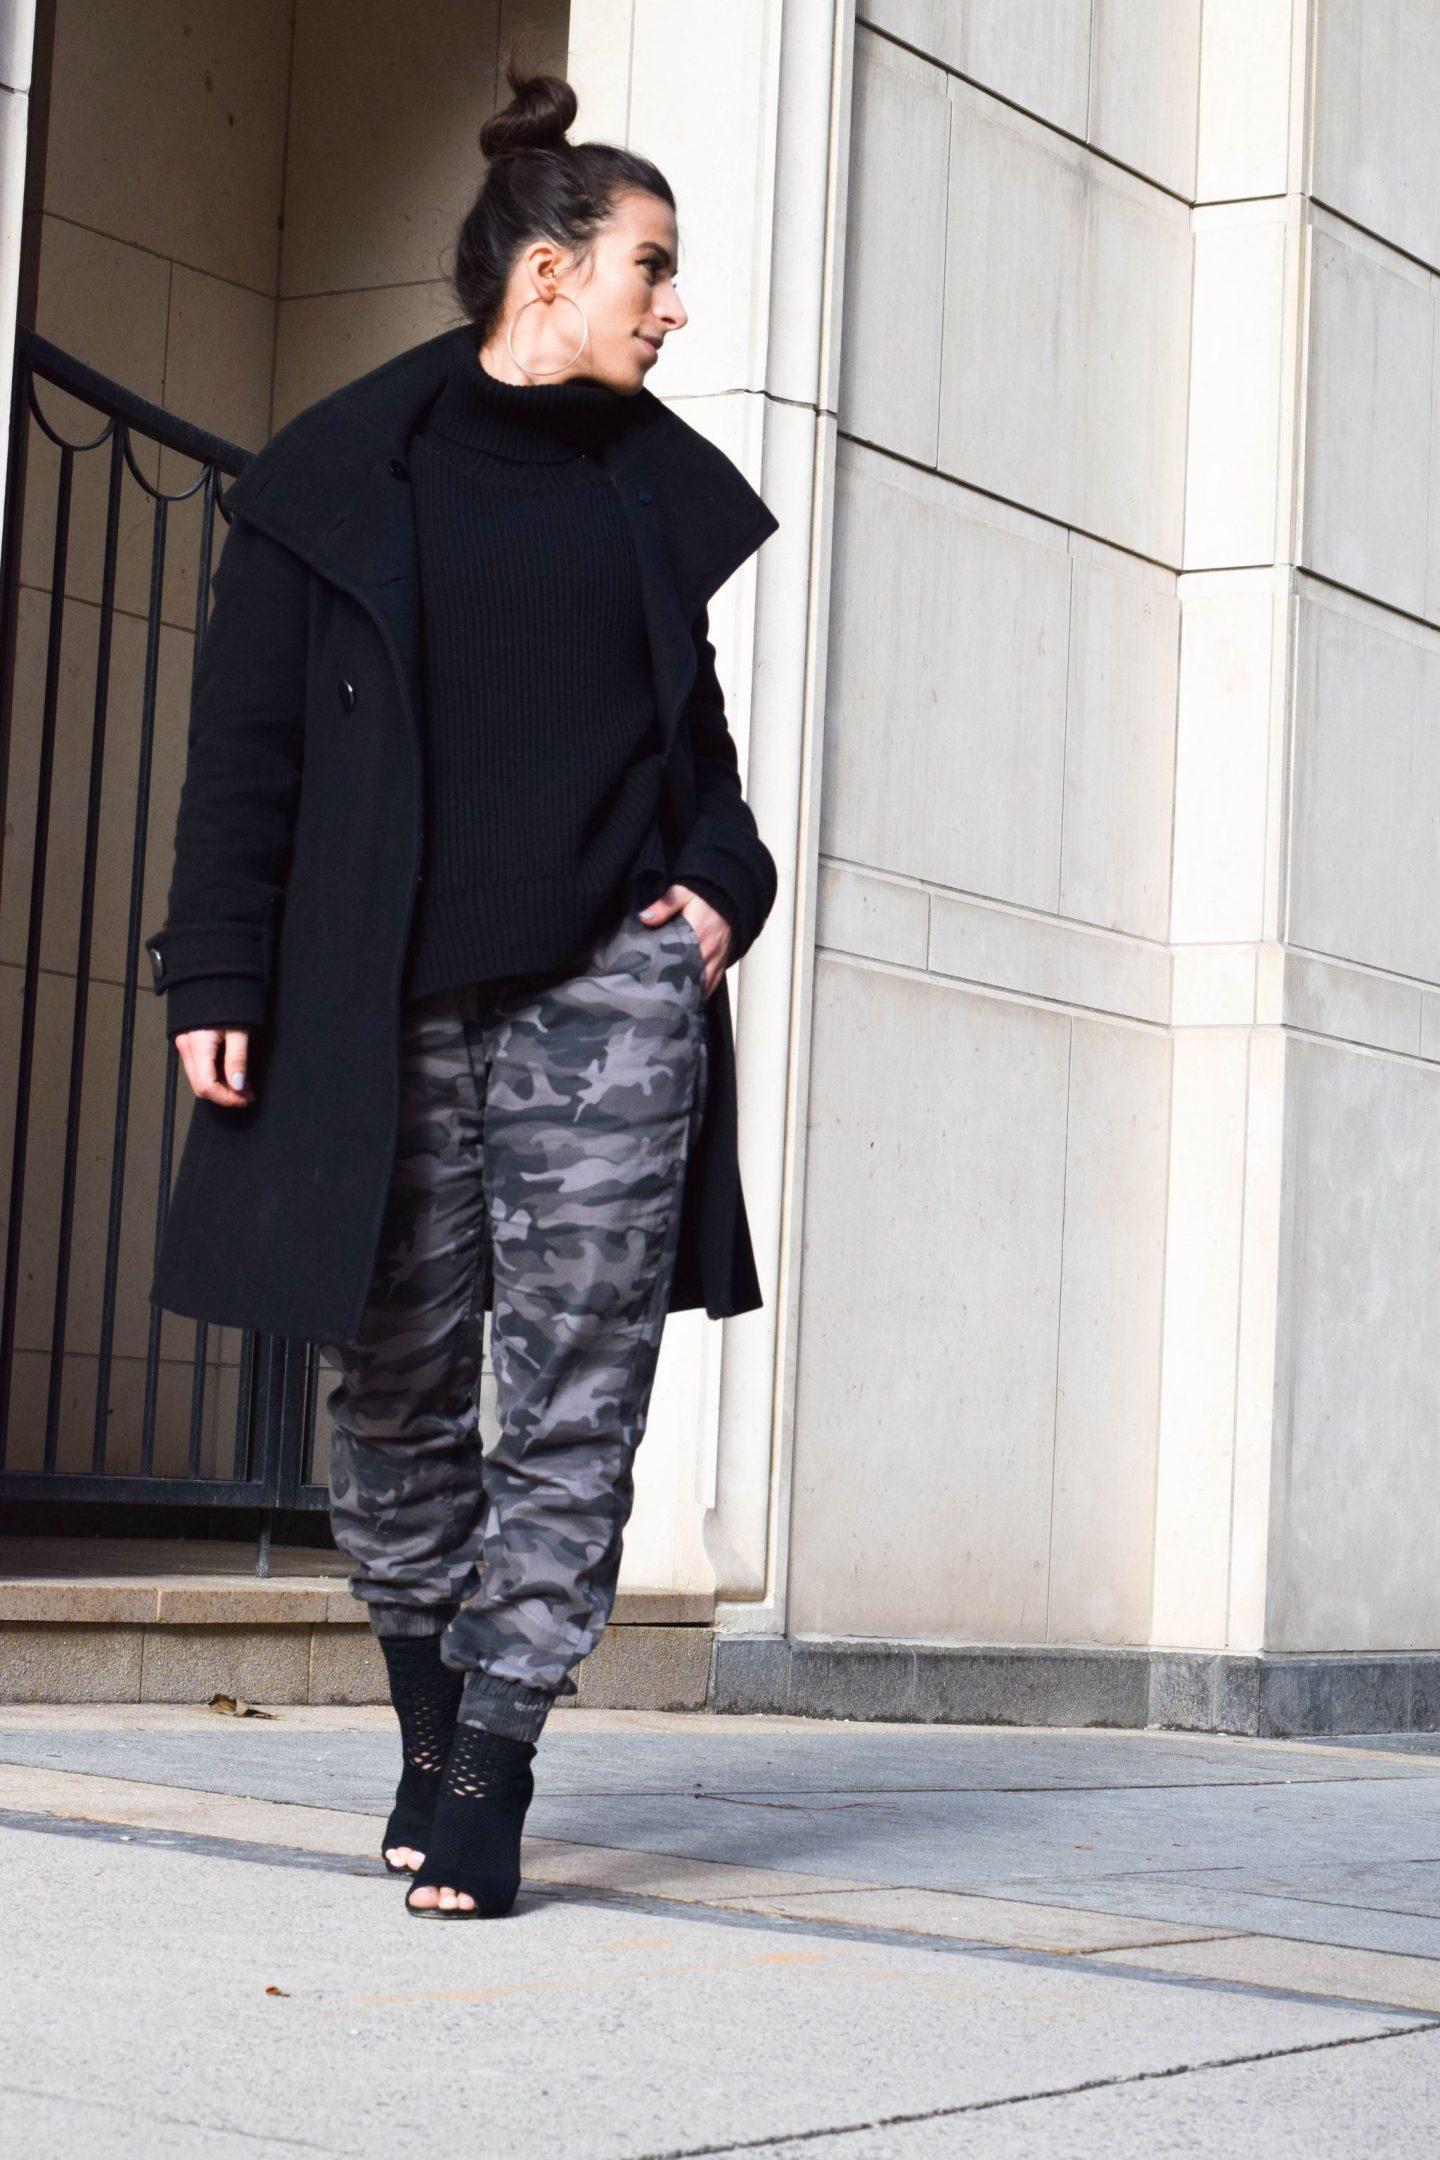 Style: Camo Chic